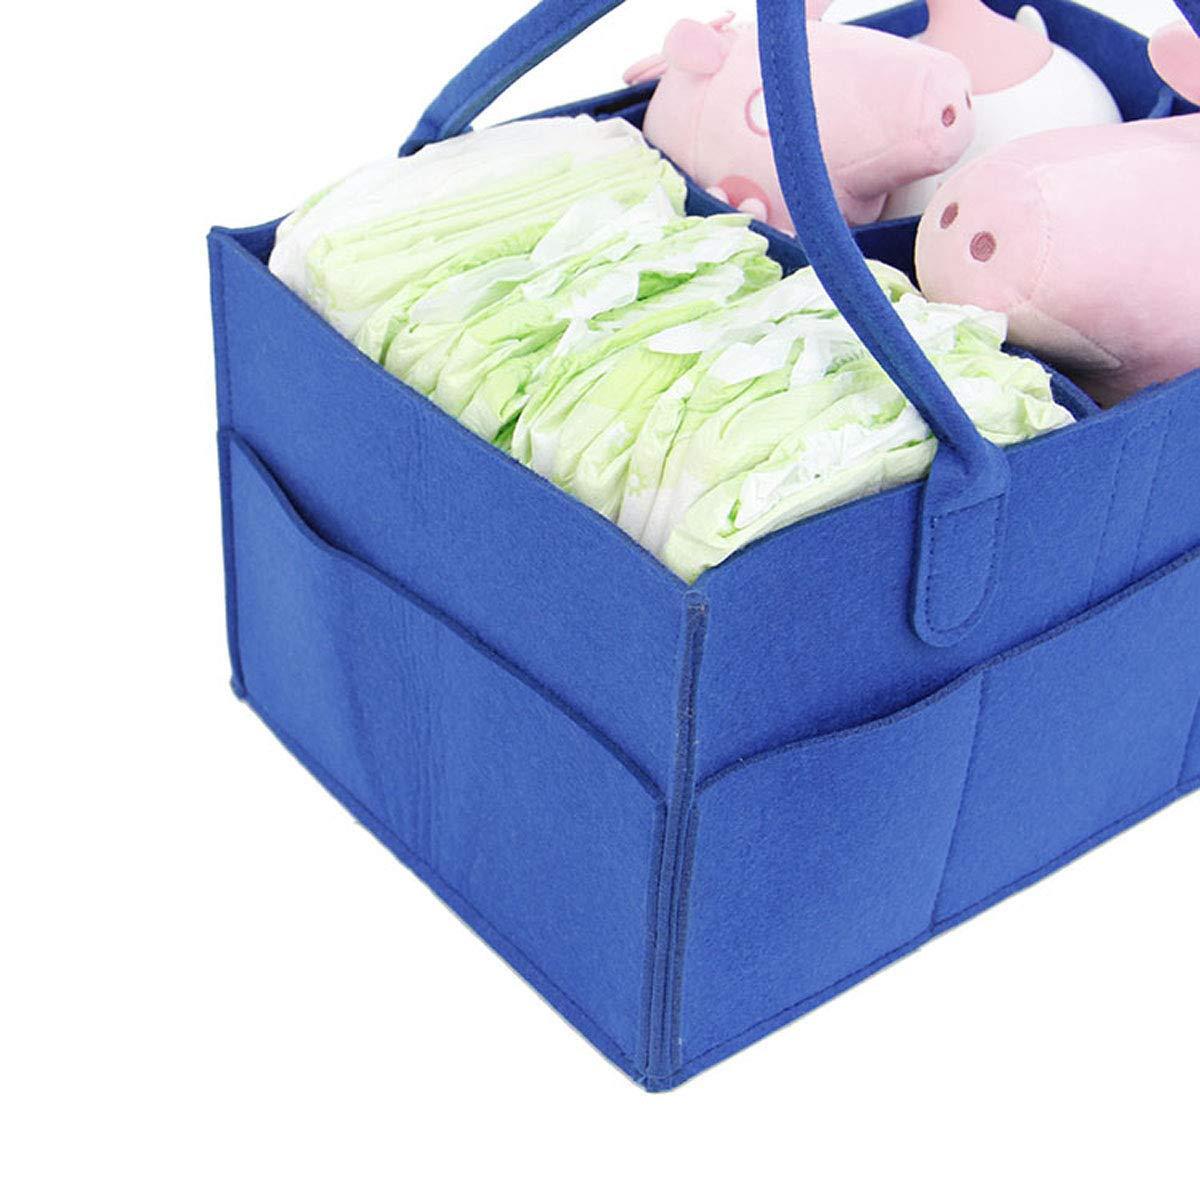 38*26*18, Black Diaper Caddy Organiser Baby Nappy Storage Nursery Bin Felt Basket Wipes Bag Portable Lightly Multifunction Changeable Compartments for Mom Newborn Kids Nappies folding storage basket